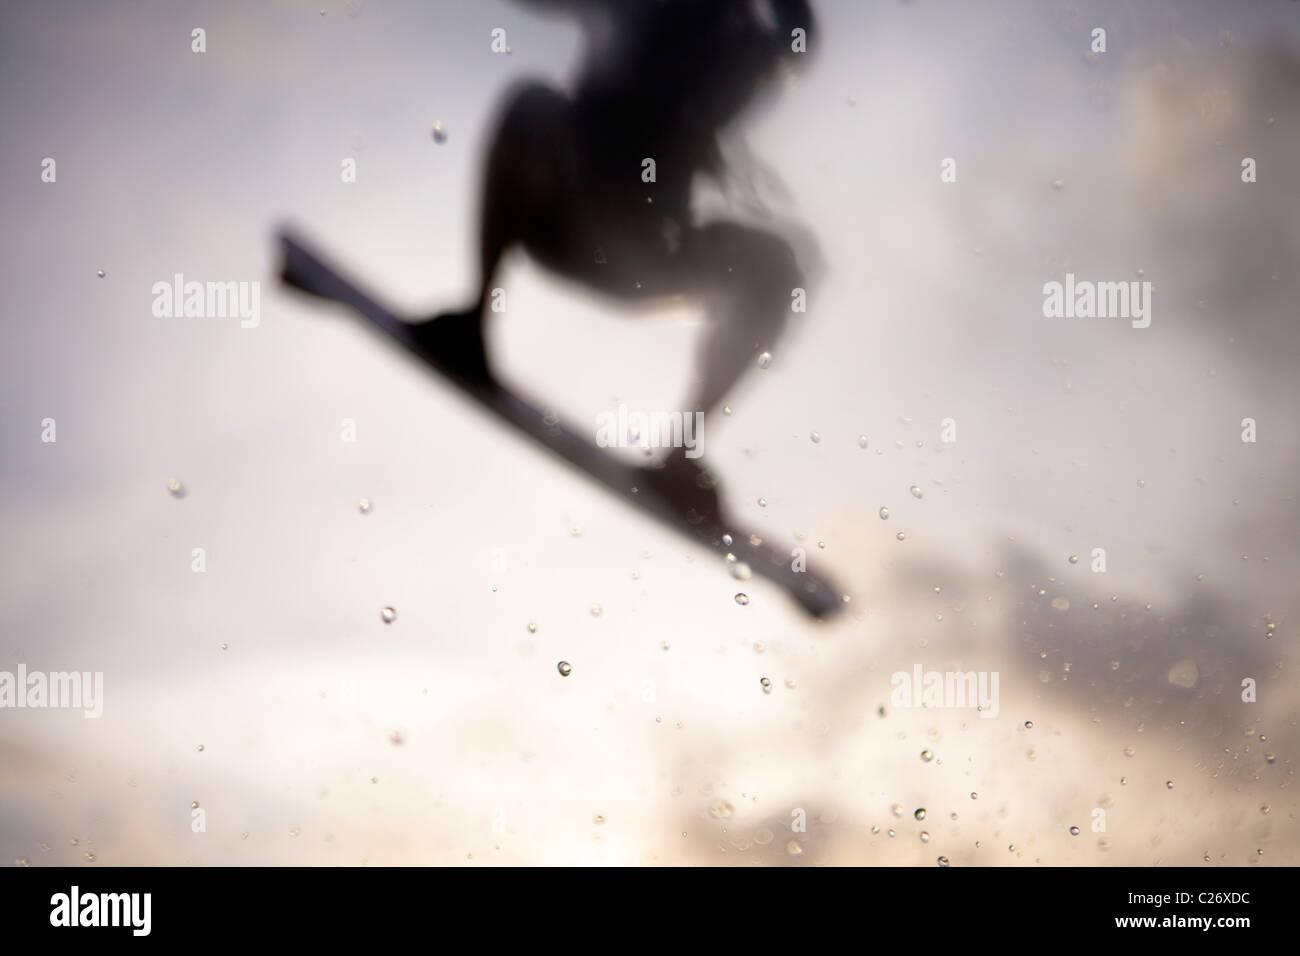 Kiteboarding Waimanalo @ Sunrise, weibliche, Nina, Airtime, springen Stockbild